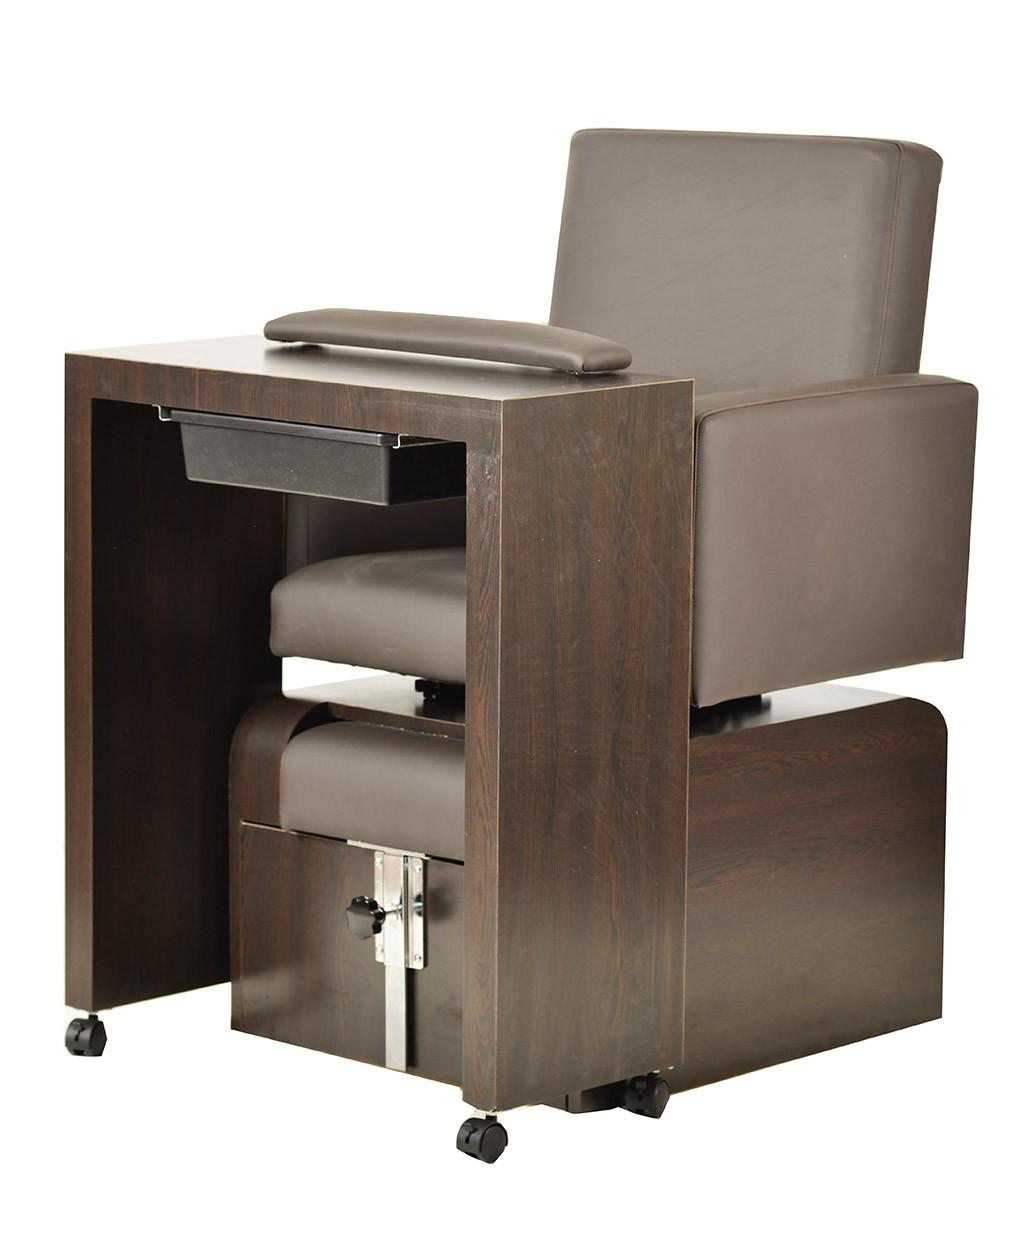 Pibbs NC01 San Remo Manicure Table